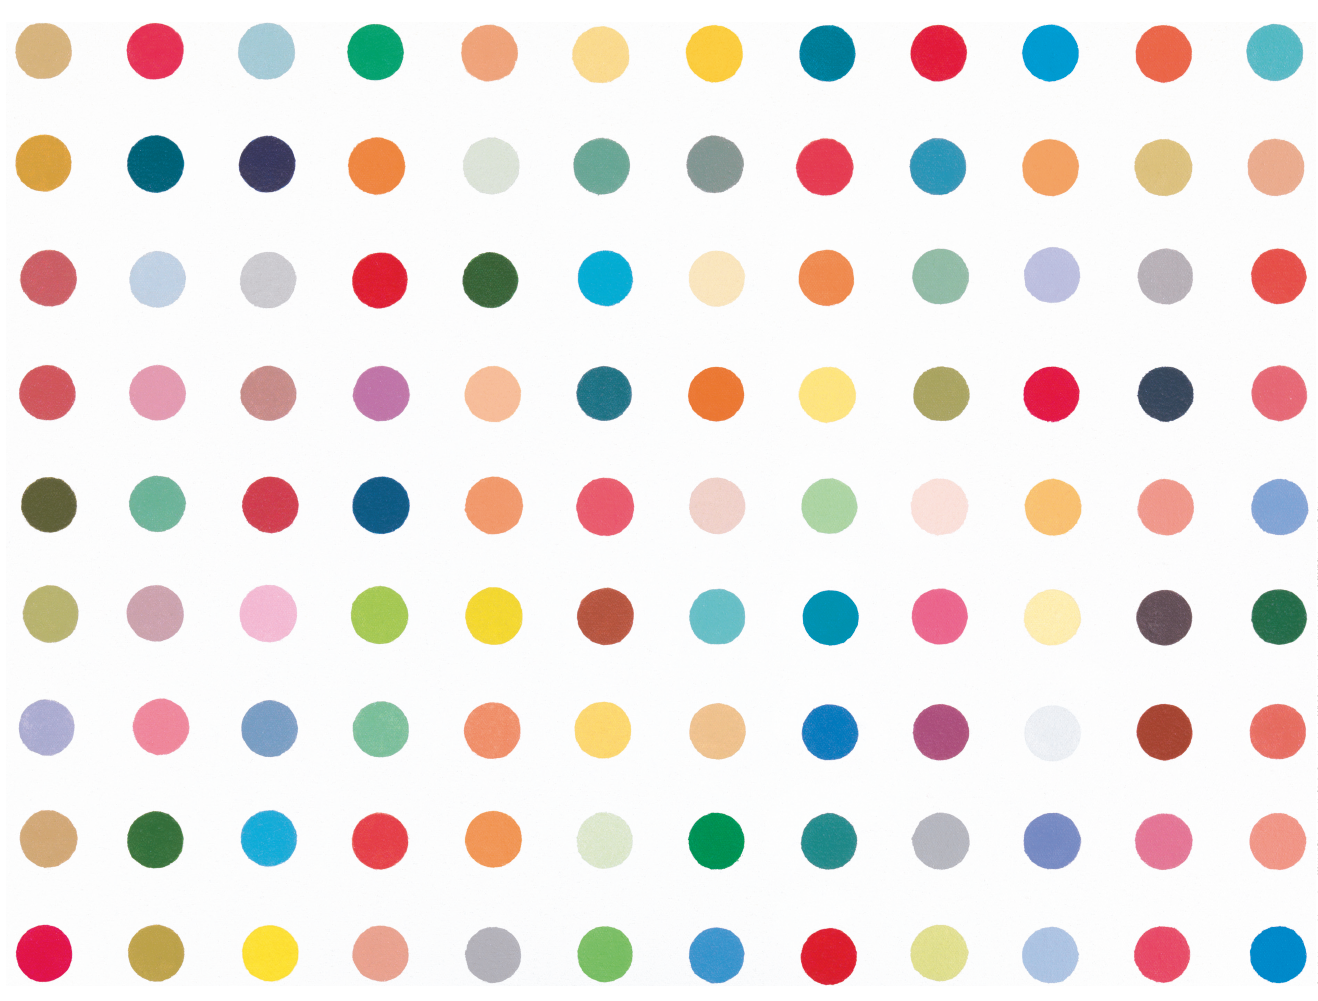 Damien Hirst dot painting